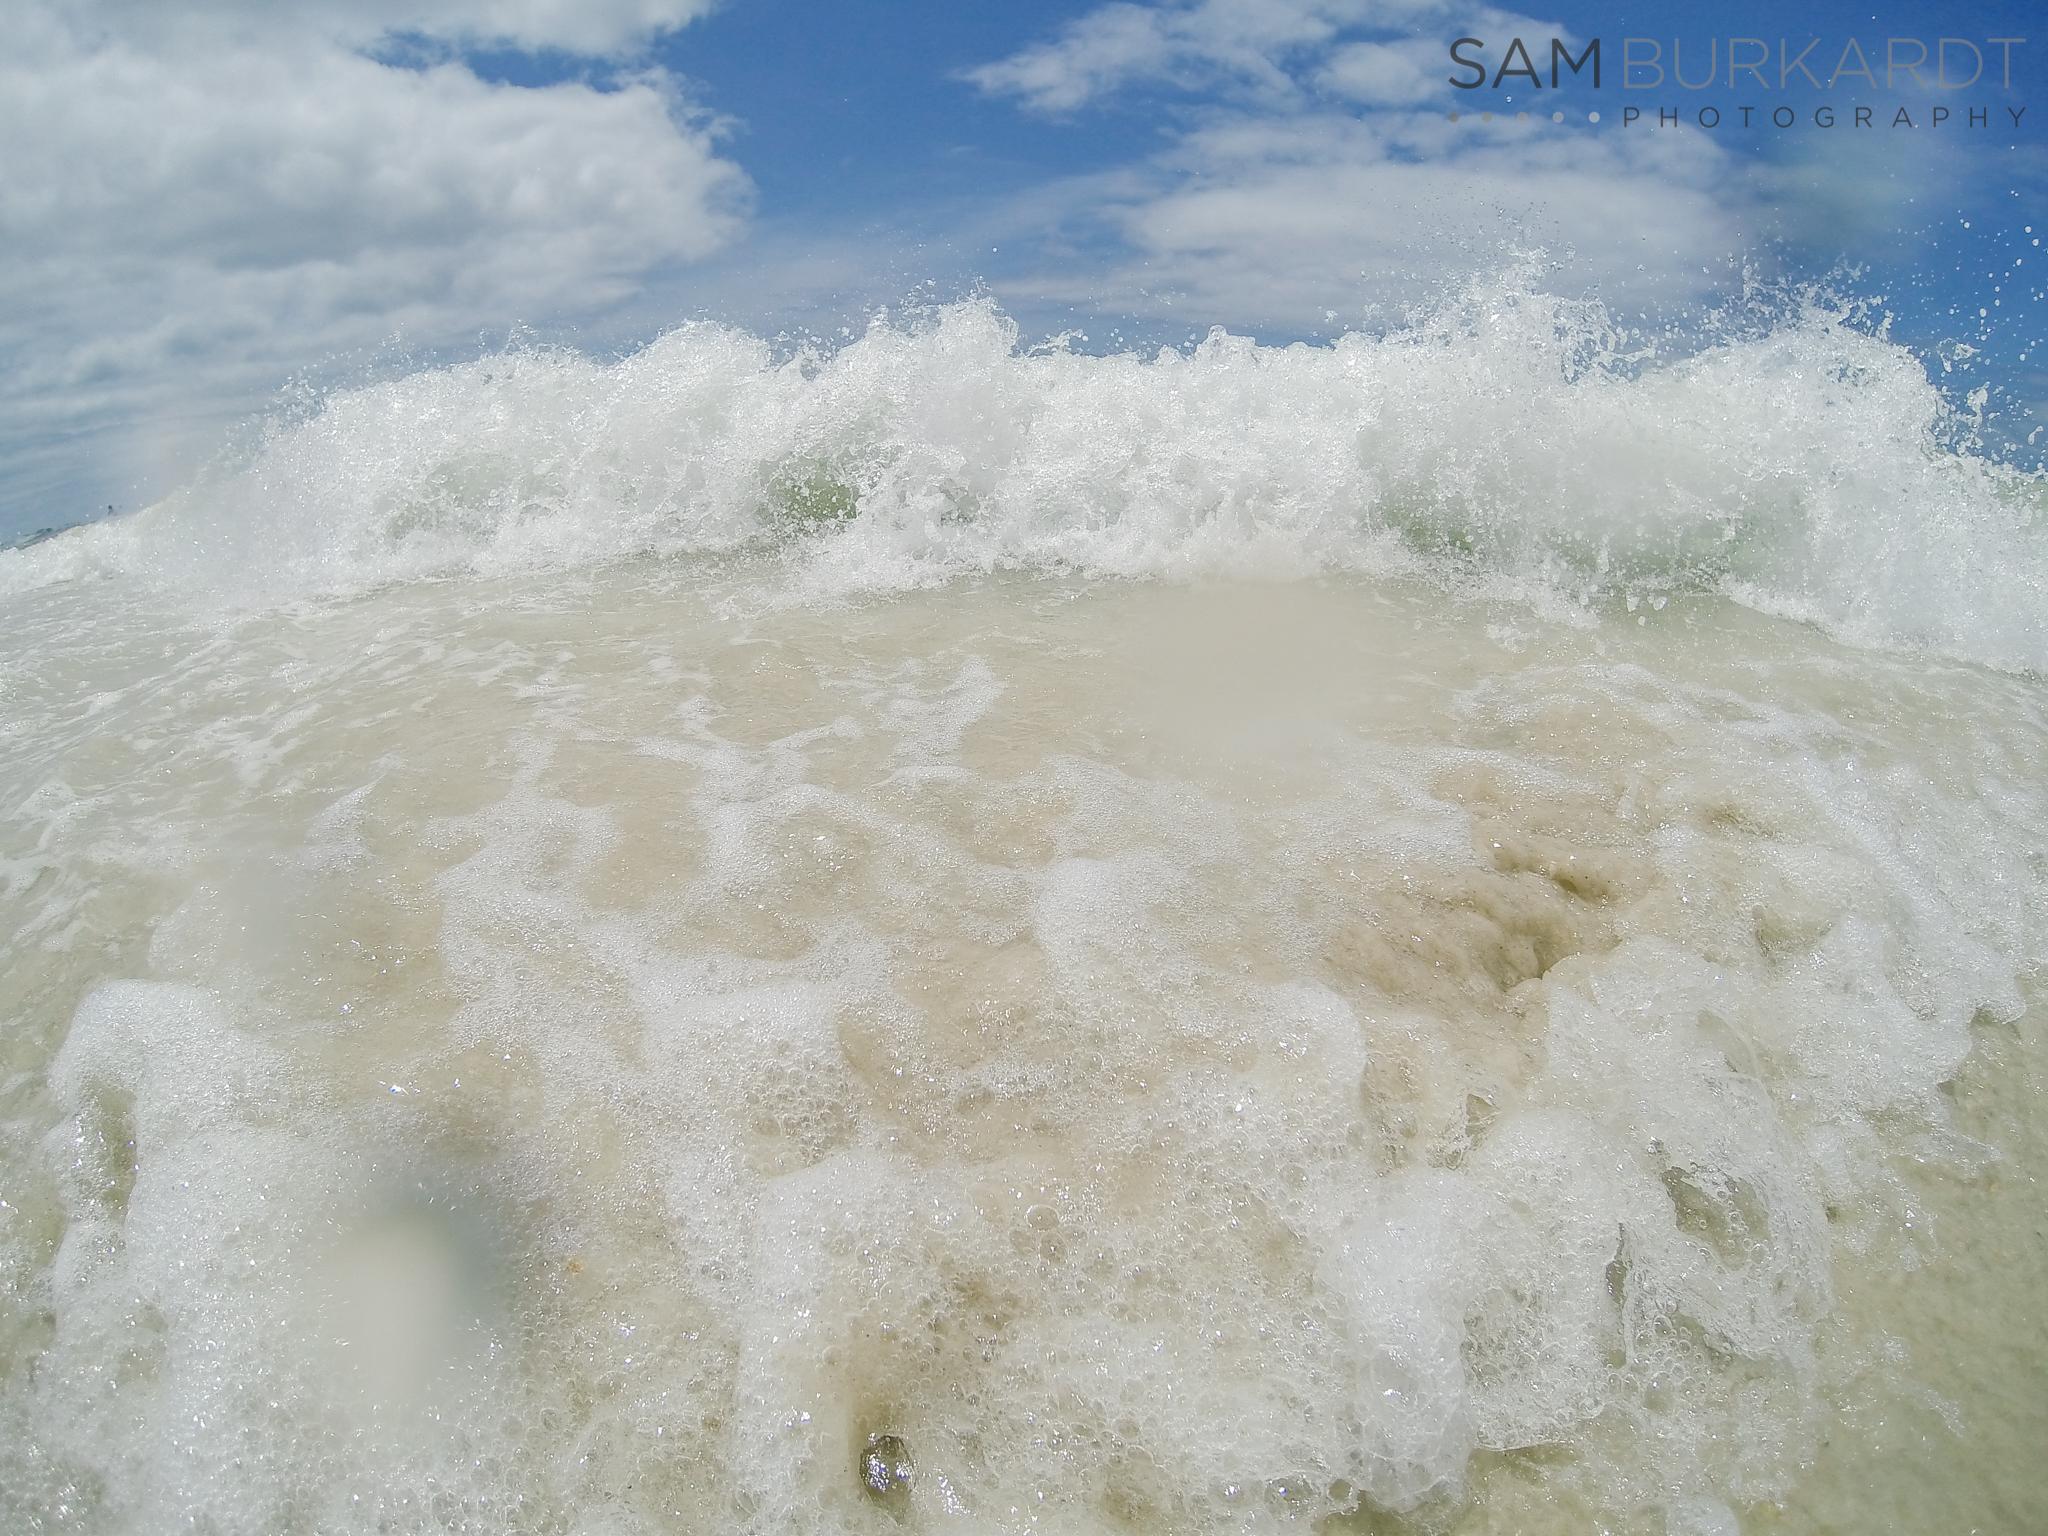 samburkardt_engagement_vacation_beach_cape_san_blas_florida_camping_gopro_0028.jpg